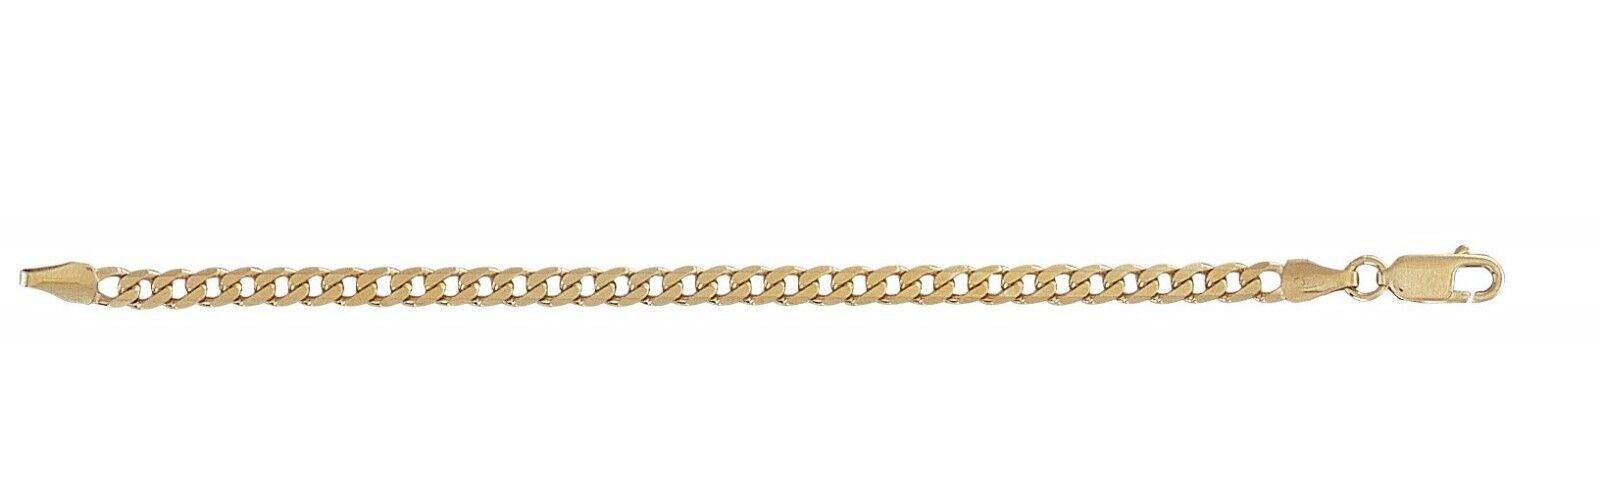 9ct gold BABIES Curb Bracelet  4mm Width   5  Length   2.4g  NEW